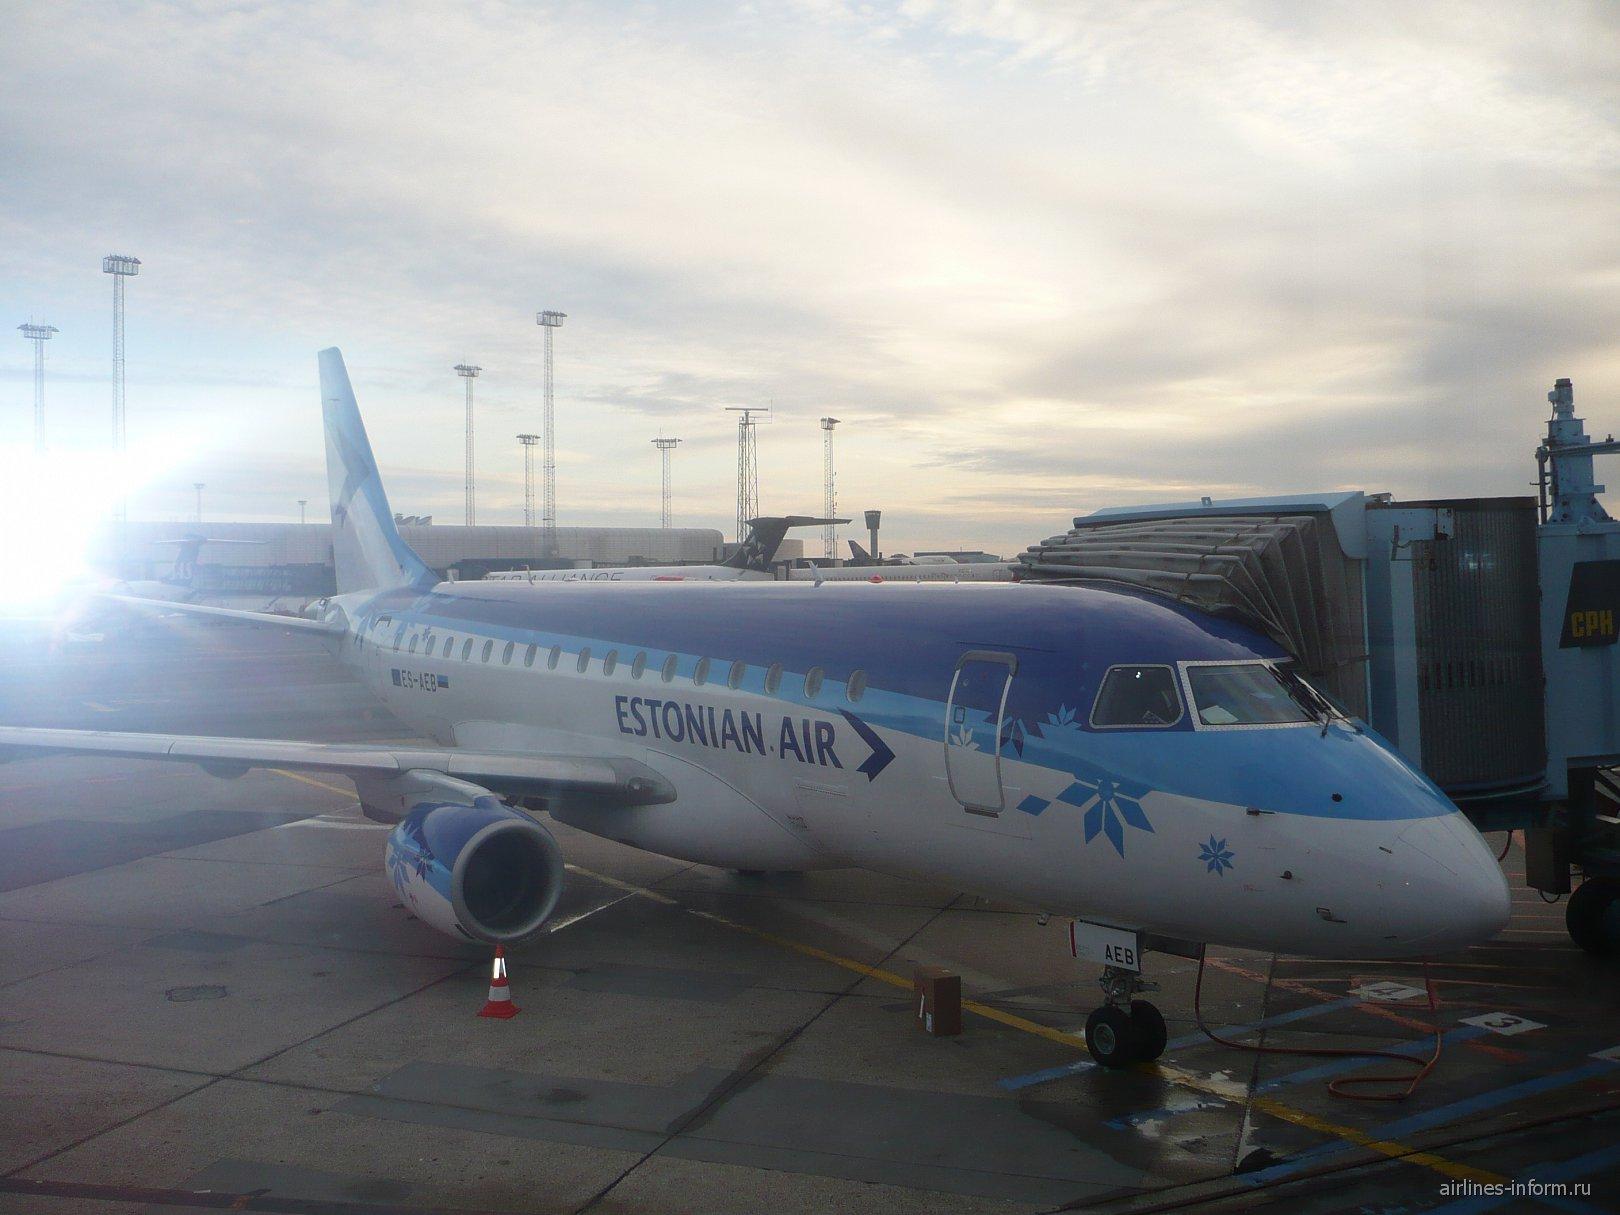 Самолет Embraer 170 авиакомпании Estonian Air